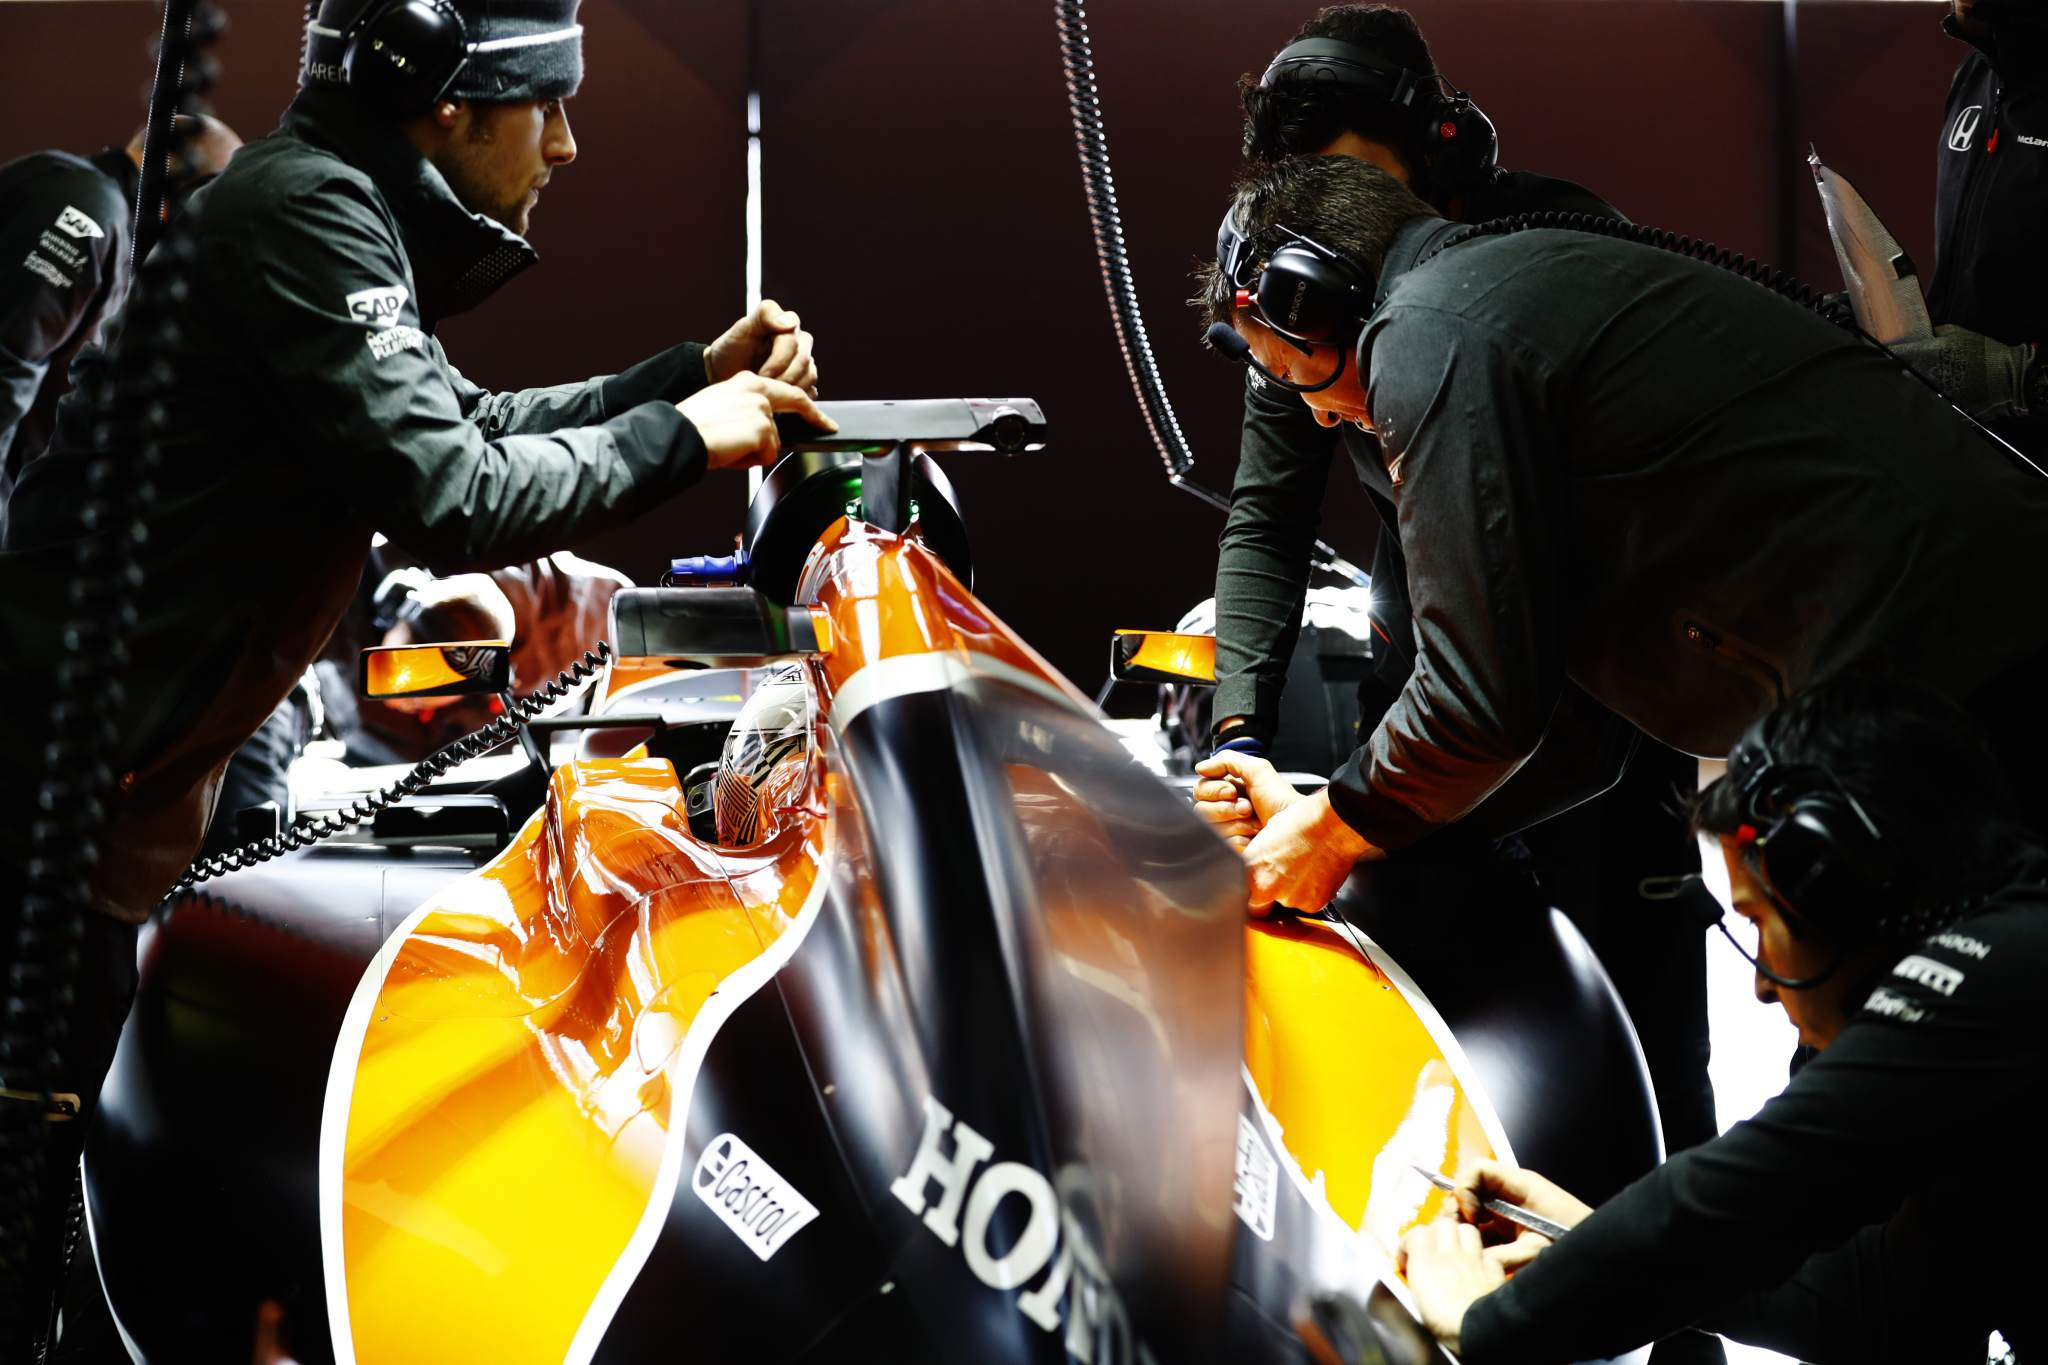 F1 testing at the Circuit de Barcelona. Photo via Stratasys.